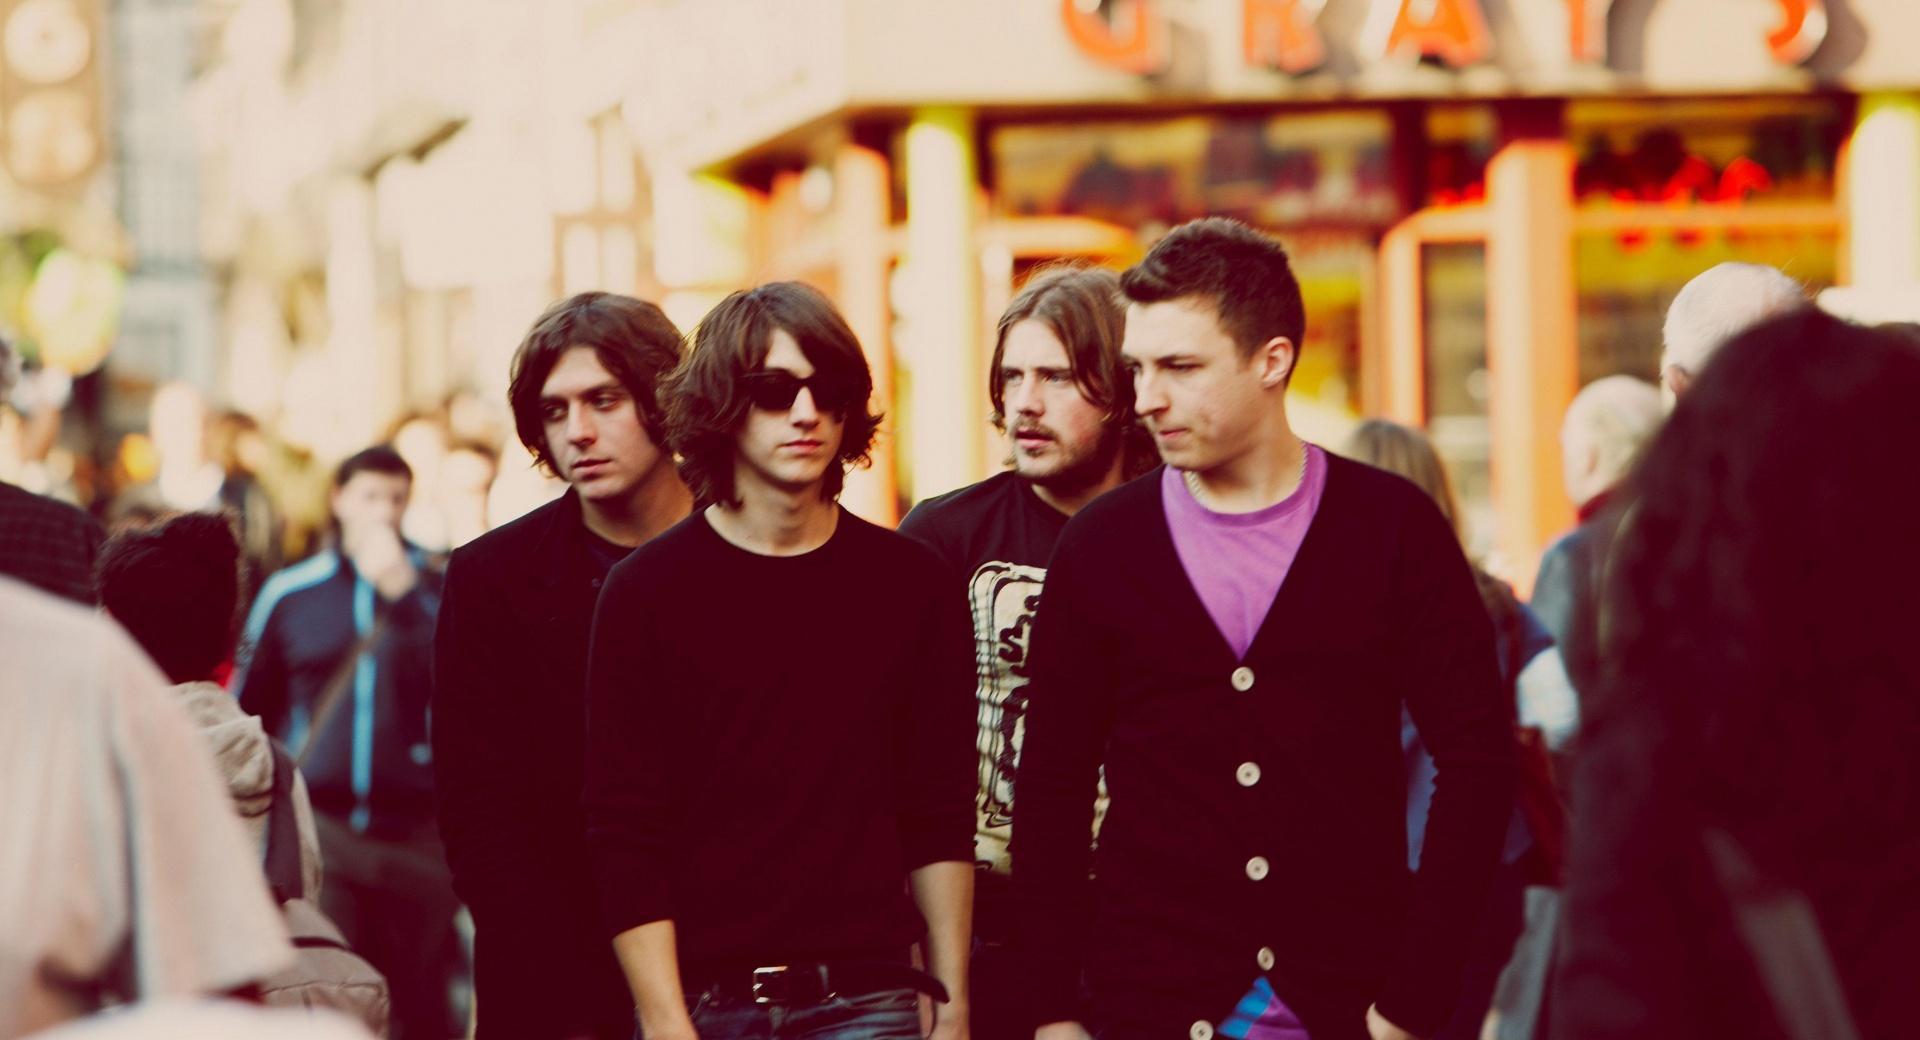 Arctic Monkeys Photo wallpapers HD quality